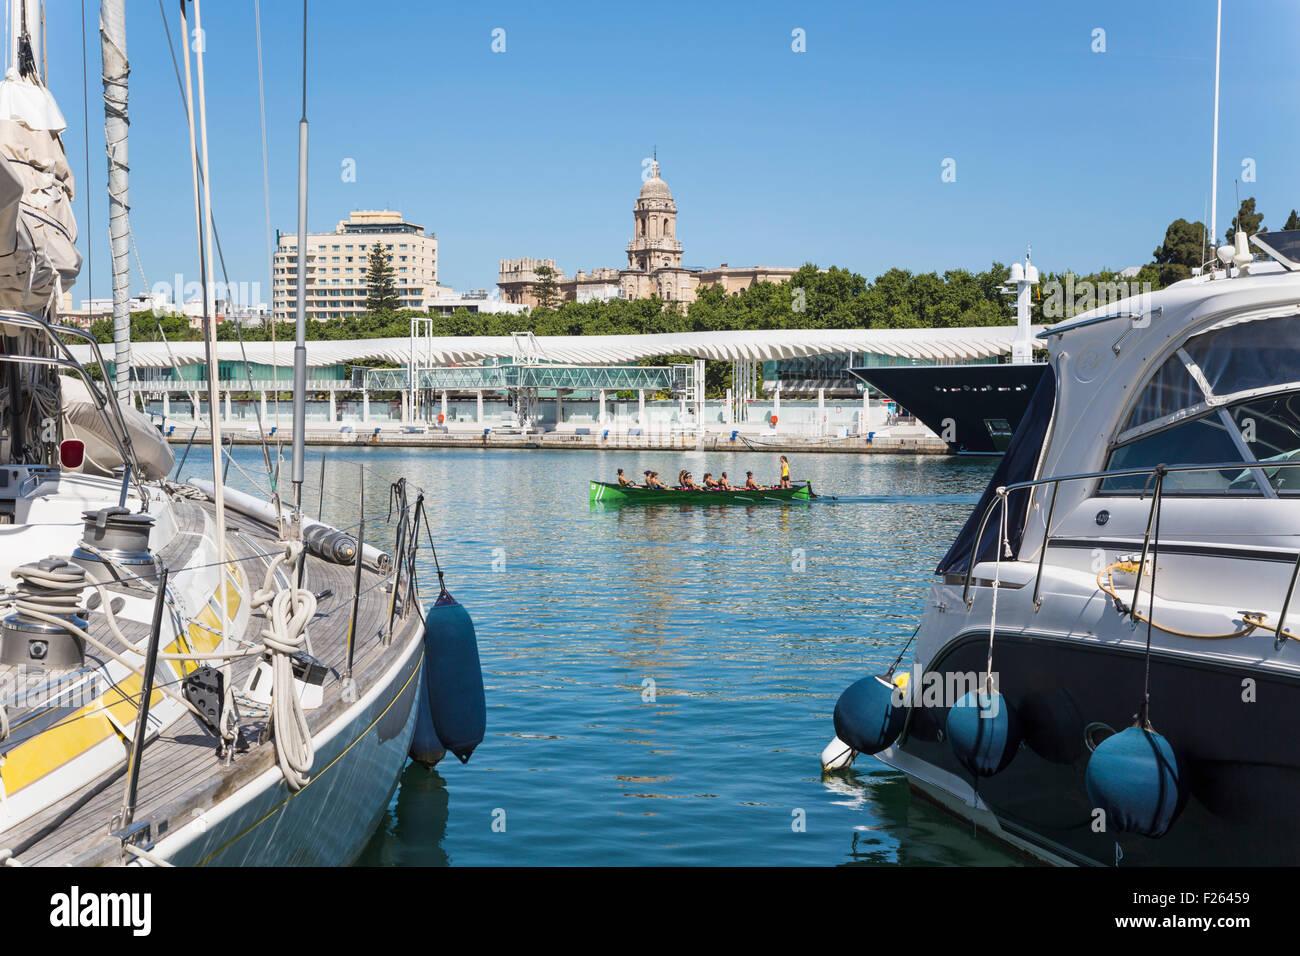 Malaga, la province de Malaga, Costa del Sol, Andalousie, Espagne du sud. Toutes les femmes à travers l'aviron Photo Stock